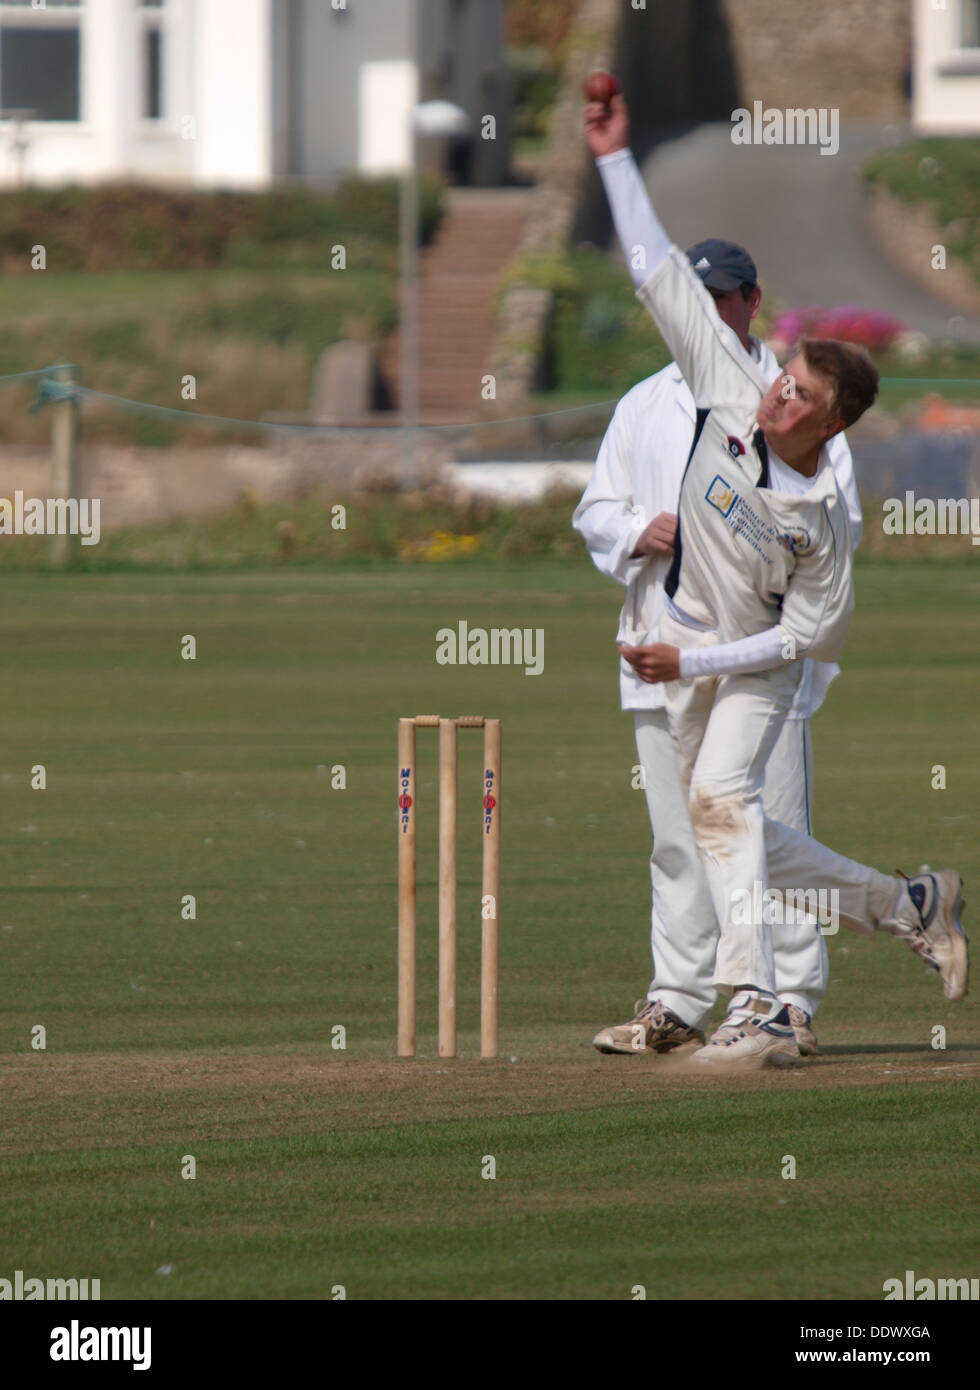 Bowler, Amateur Cricket match, Bude, Cornwall, UK 2013 - Stock Image